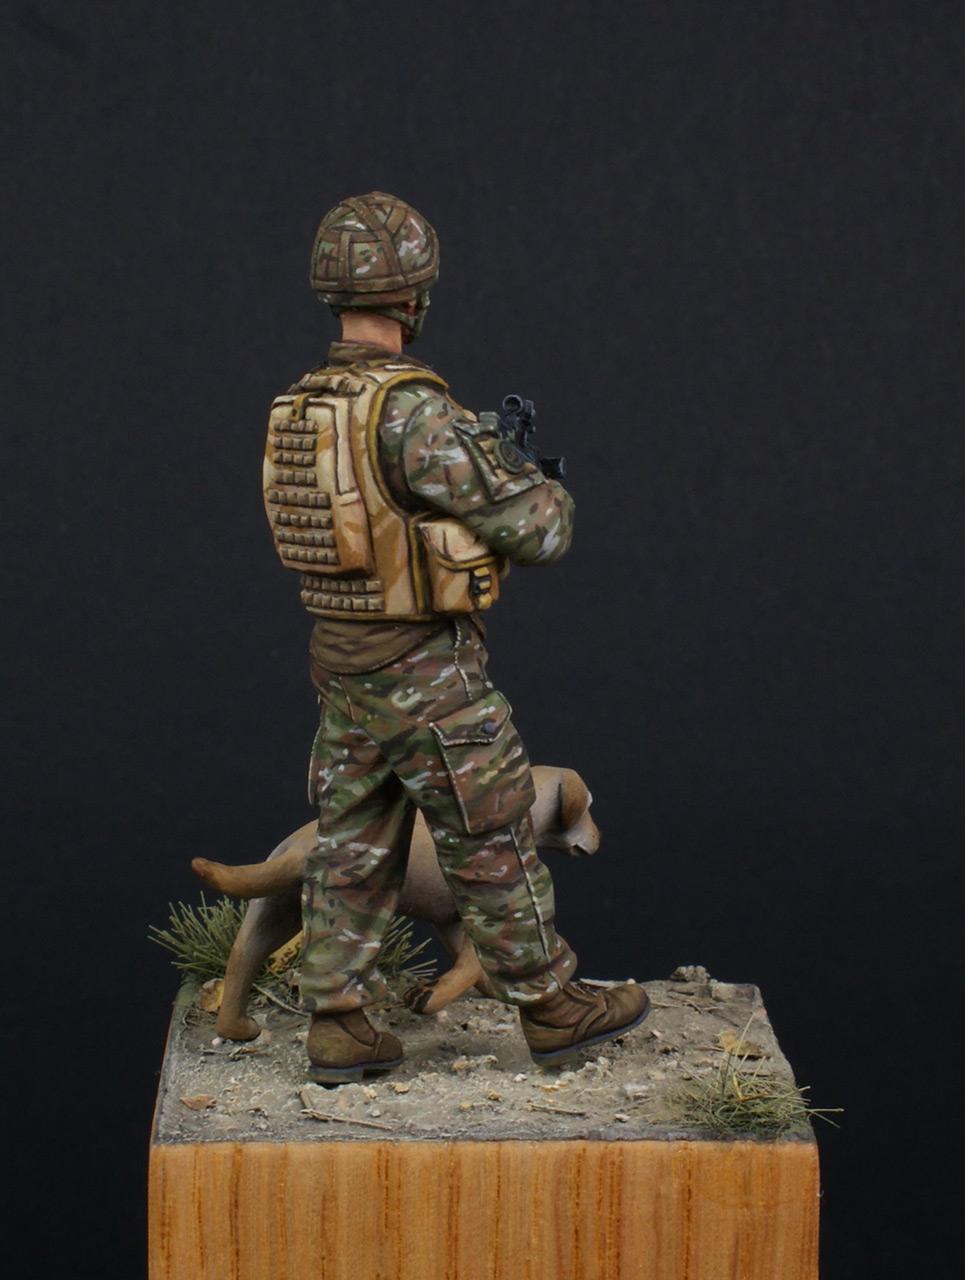 Figures: Patrol in Helmand, photo #8